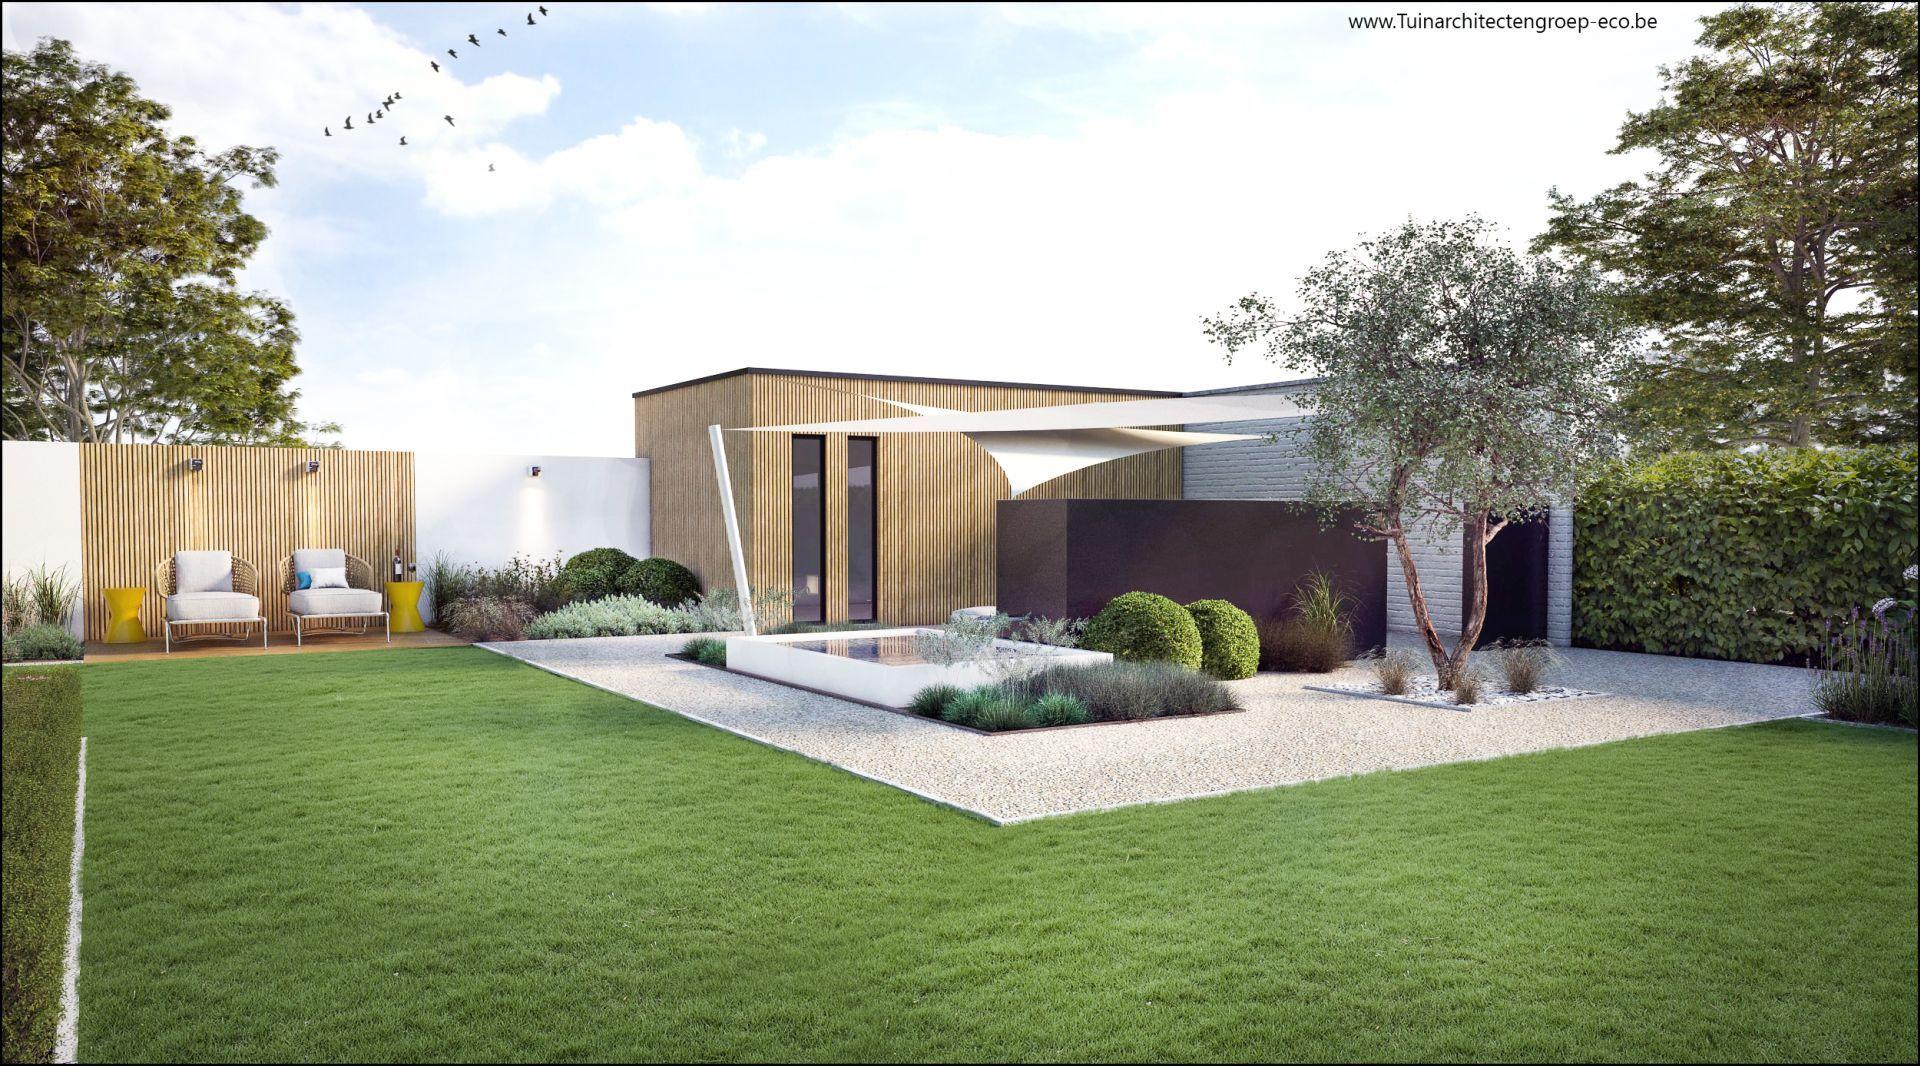 Groupe Eco Paysagiste | Projets 3D | Jardin Moderne Ninove ... pour 3D Jardin & Paysagisme